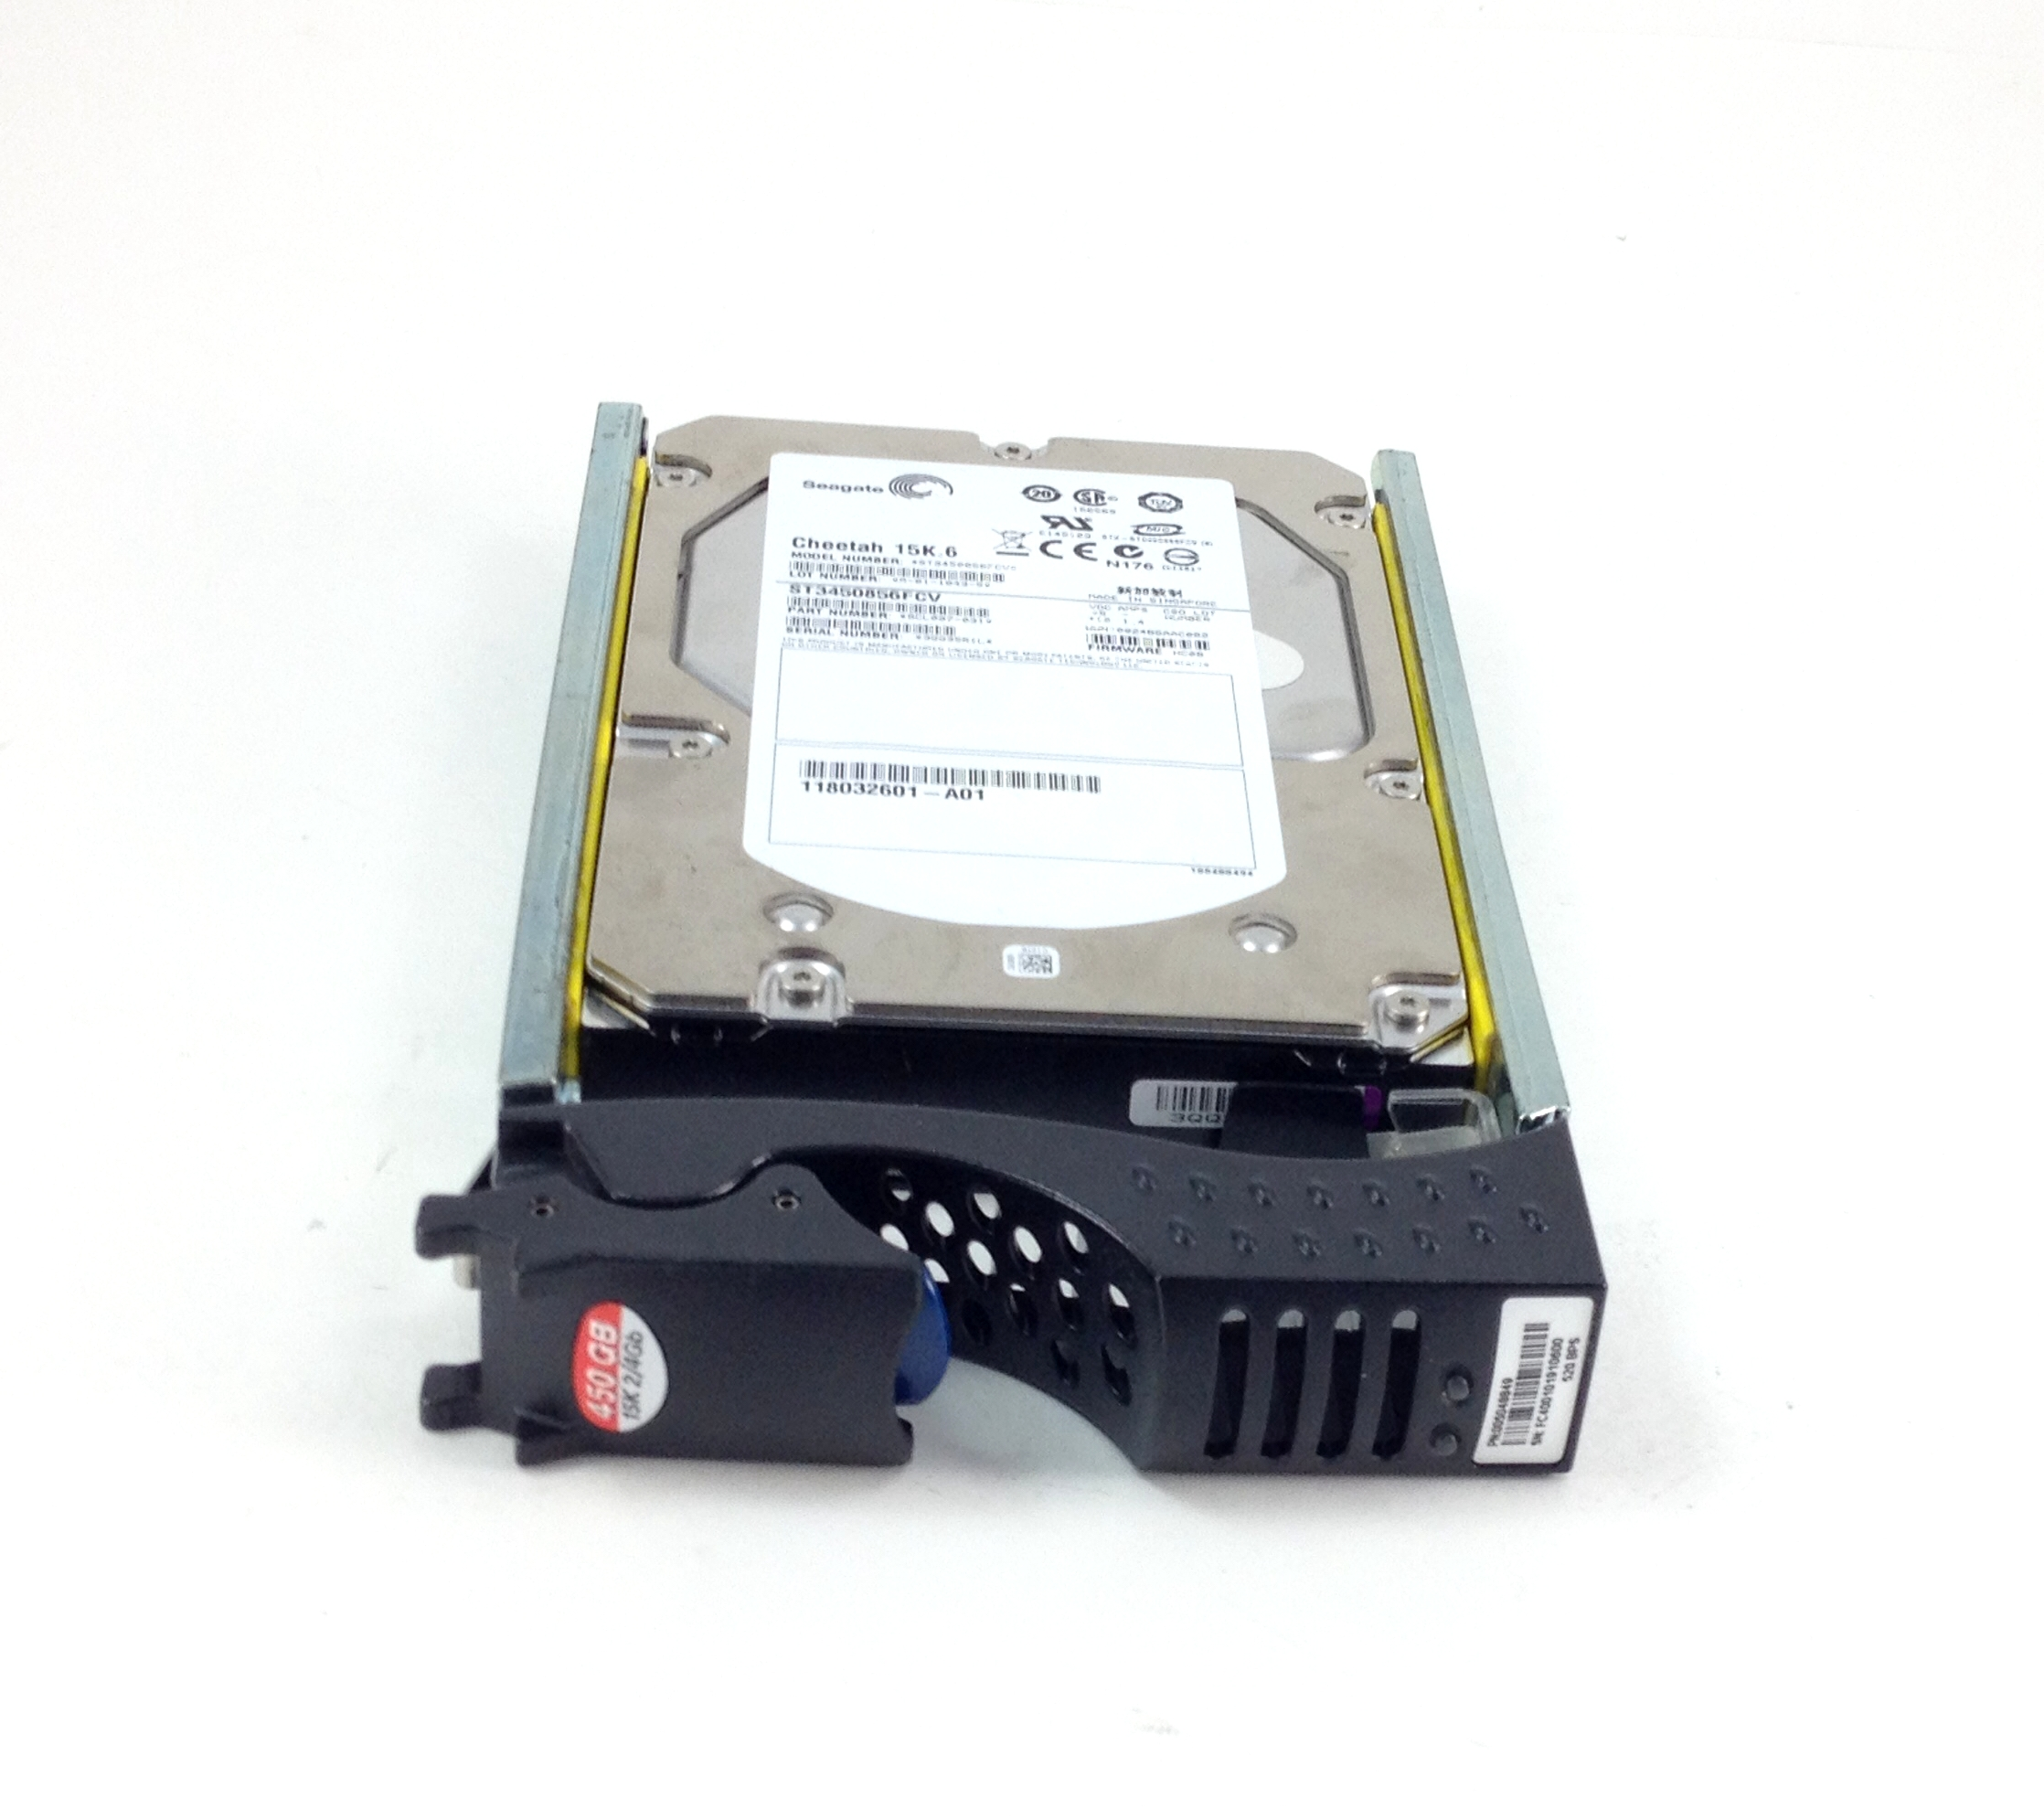 EMC Seagate 450GB 15K 4Gbps FC Hard Drive w/ Tray (ST3450856FCV)